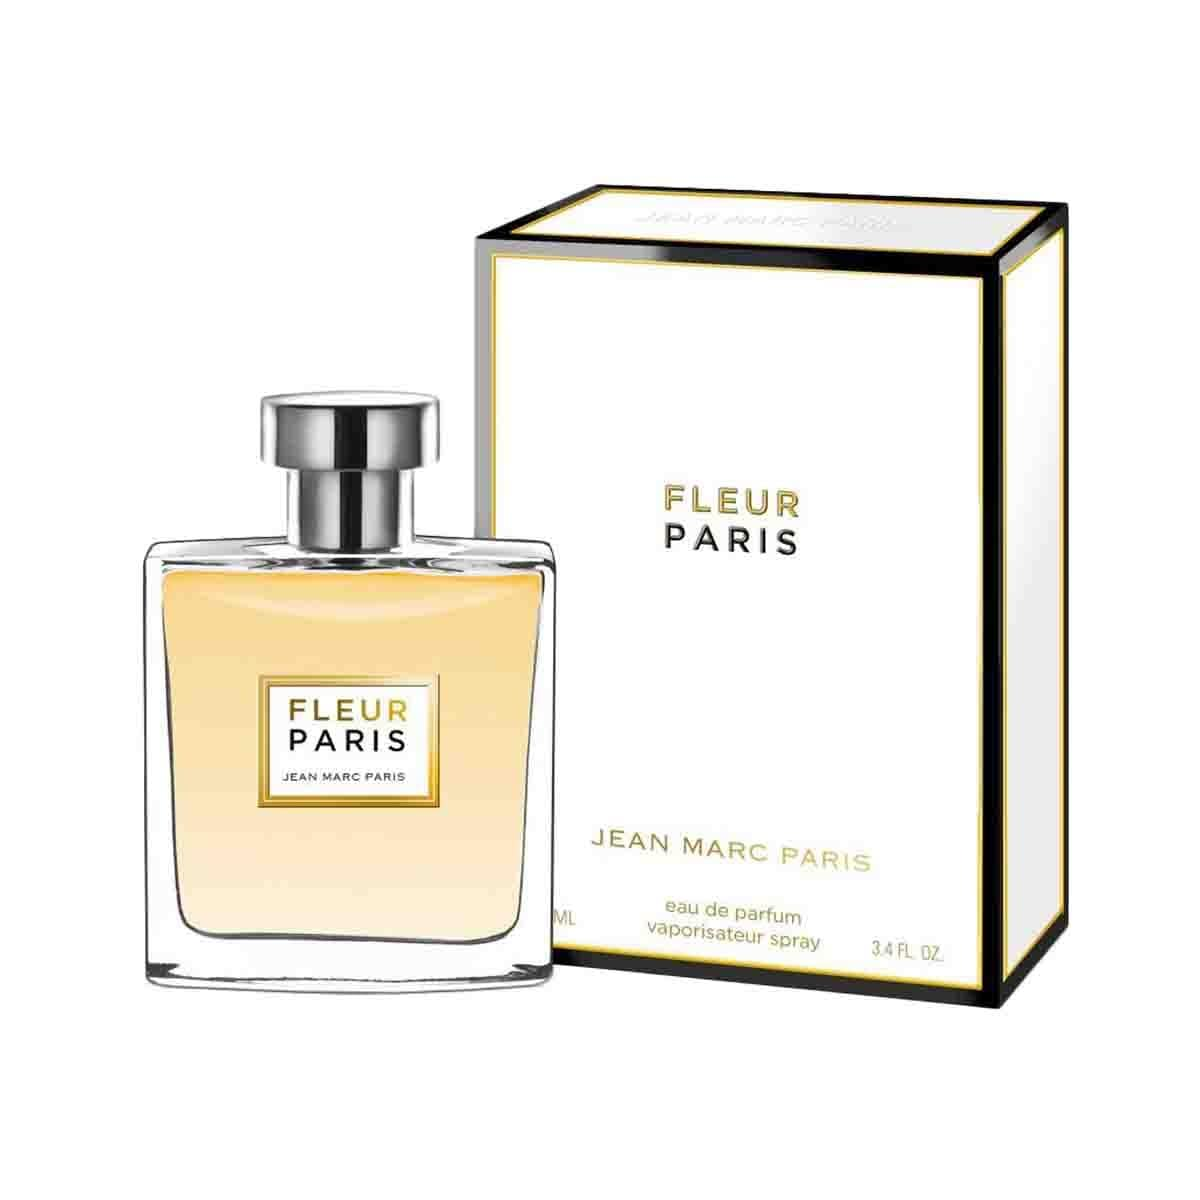 Fragancia para Dama Jean Marc Paris Fleur Paris Edt 100 Ml